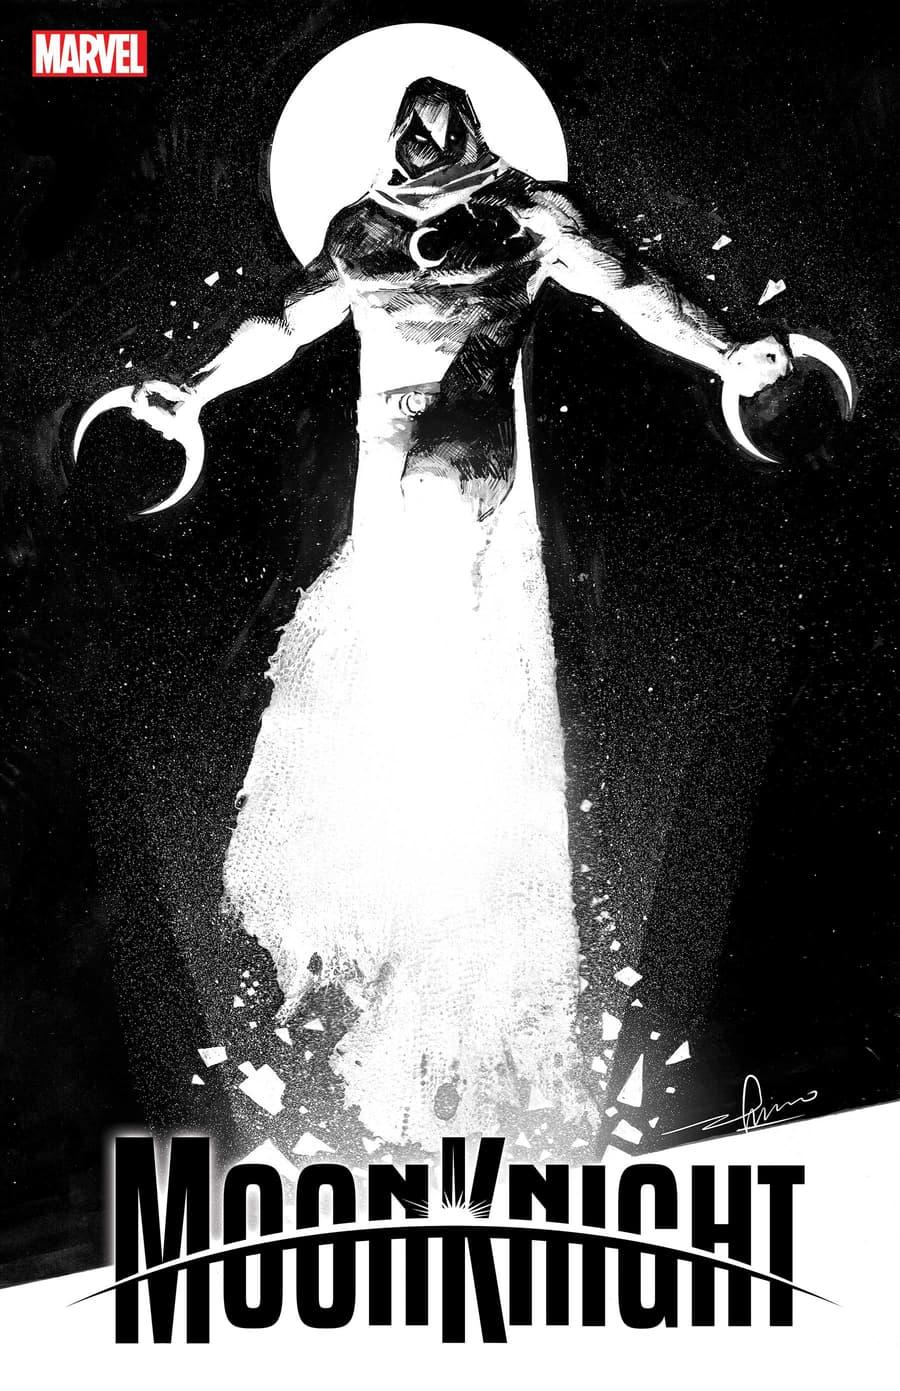 MOON KNIGHT #1 variant cover by Gerardo Zaffino